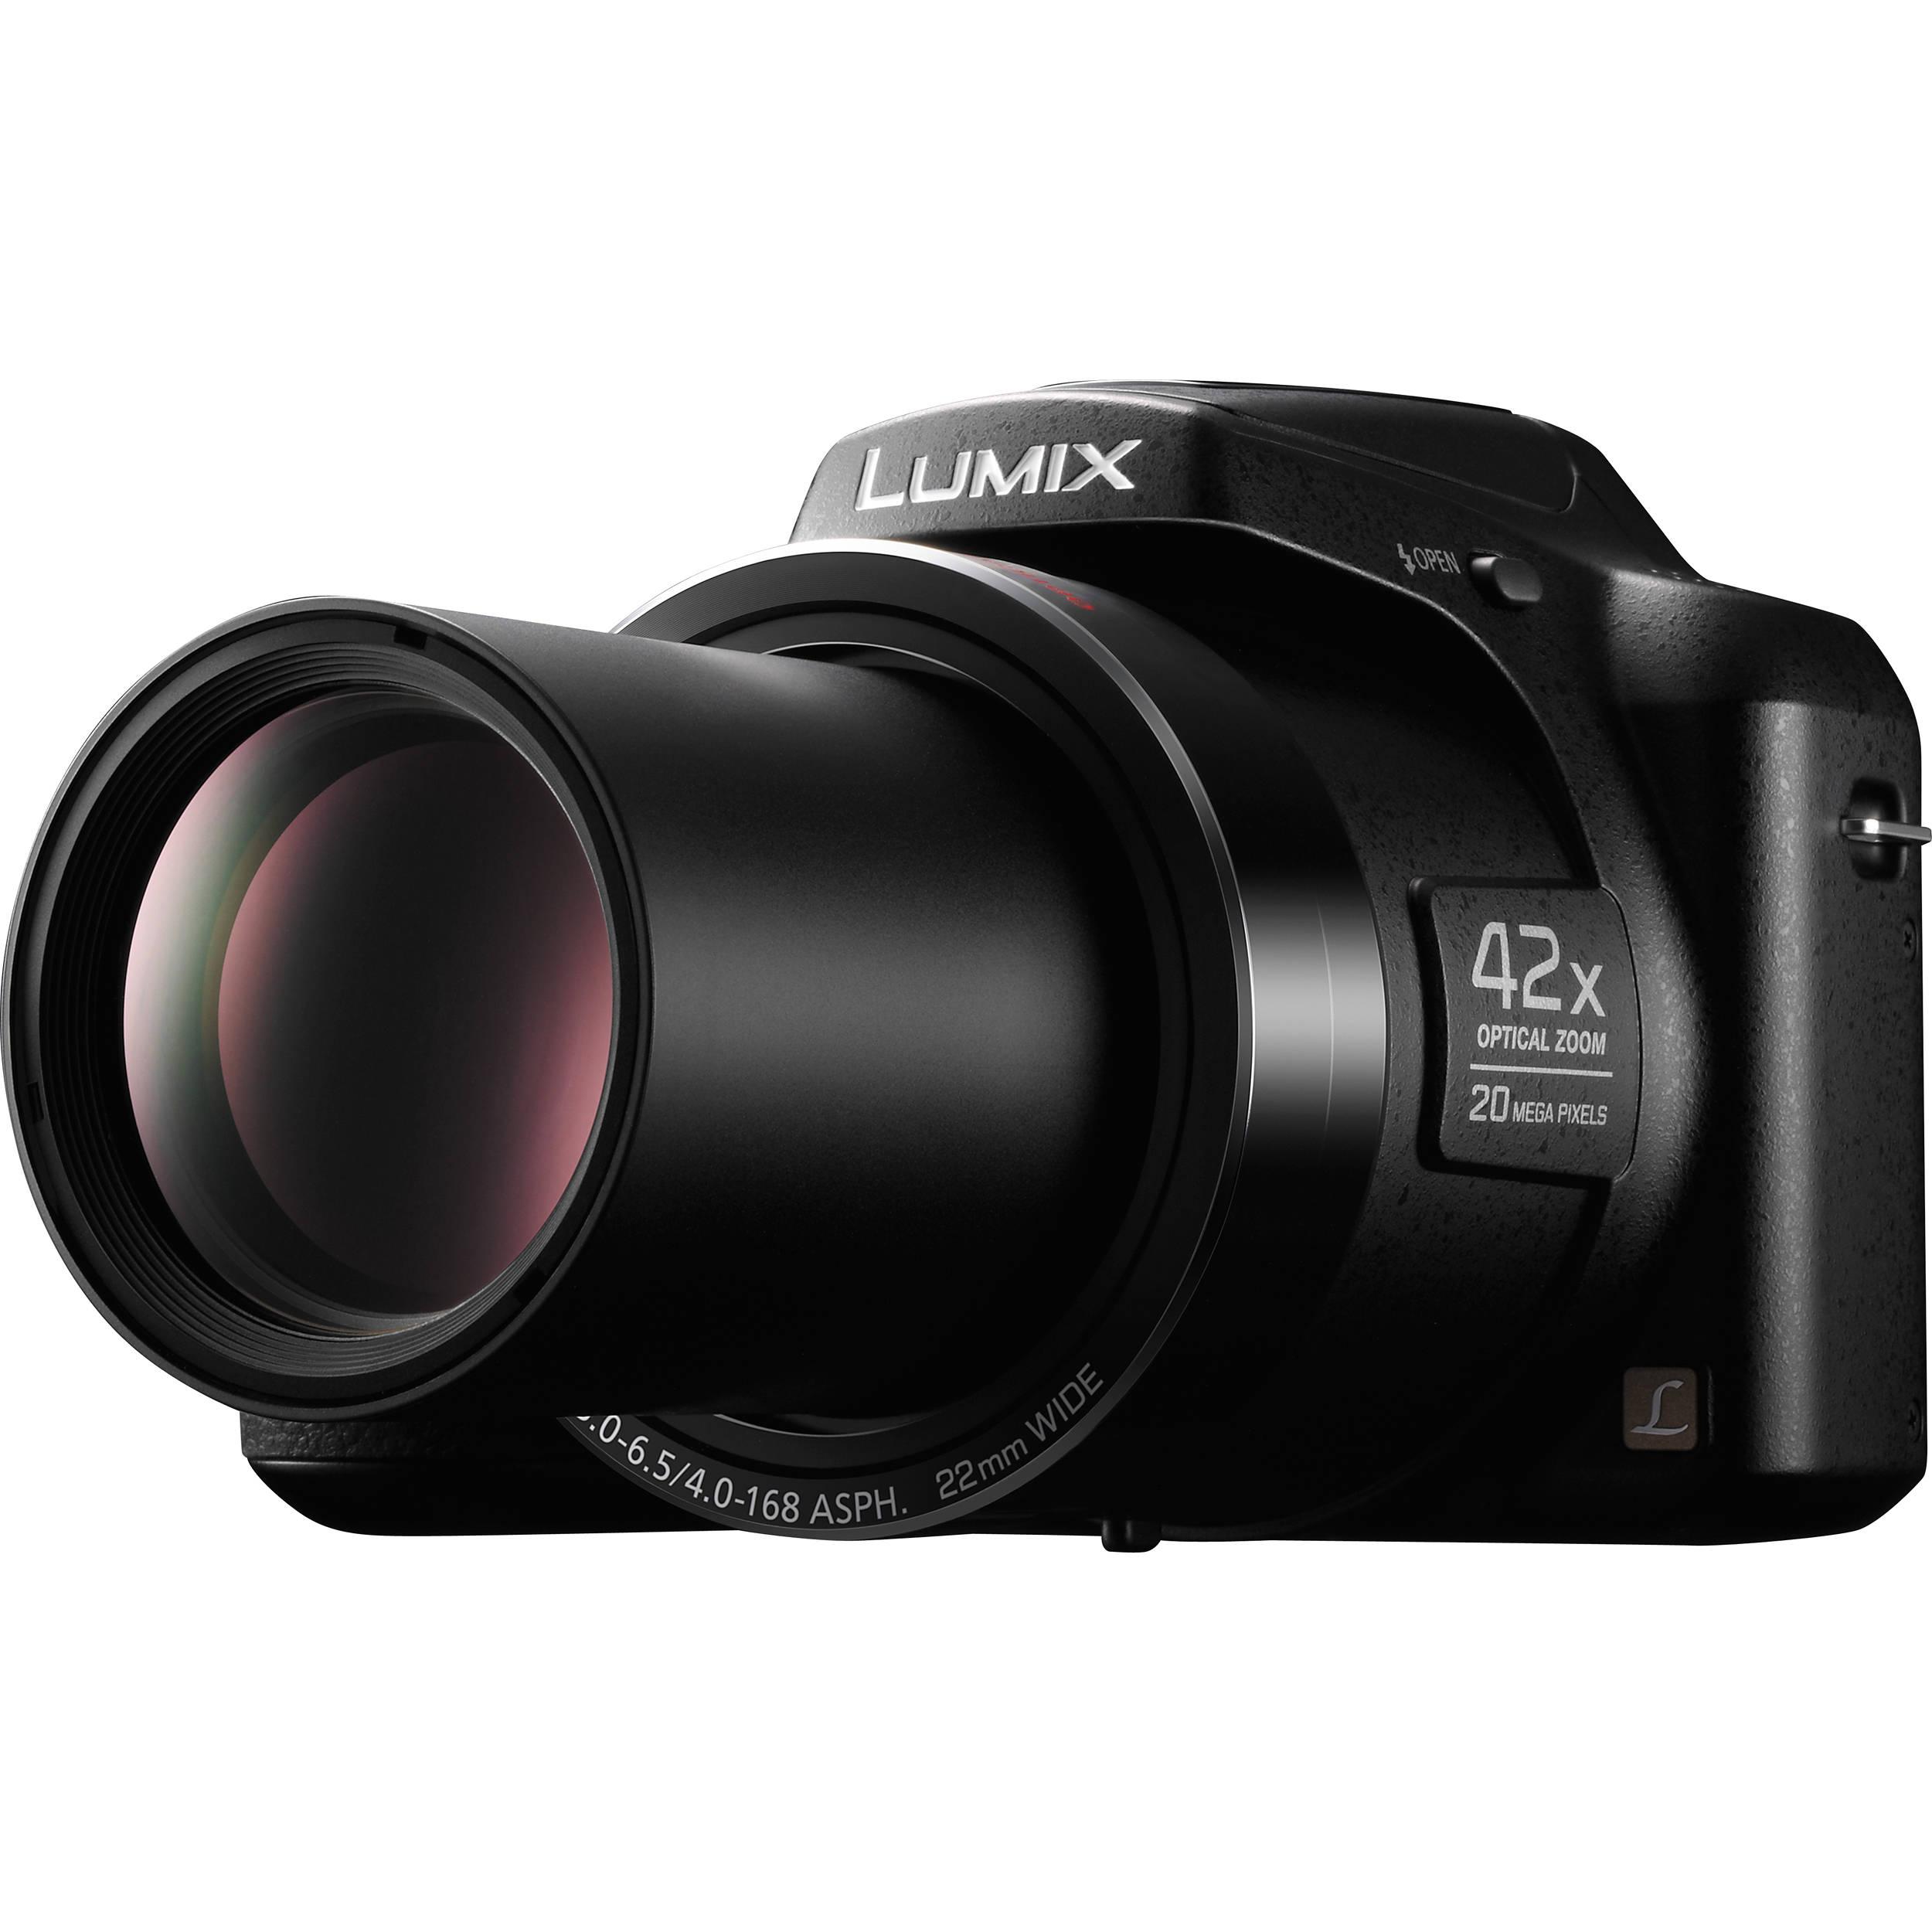 SDHC Secure Digital High Capacity Class 4 Flash Cards Pack of 2 Panasonic Lumix DMC-LZ40 Digital Camera Memory Card 2 x 8GB